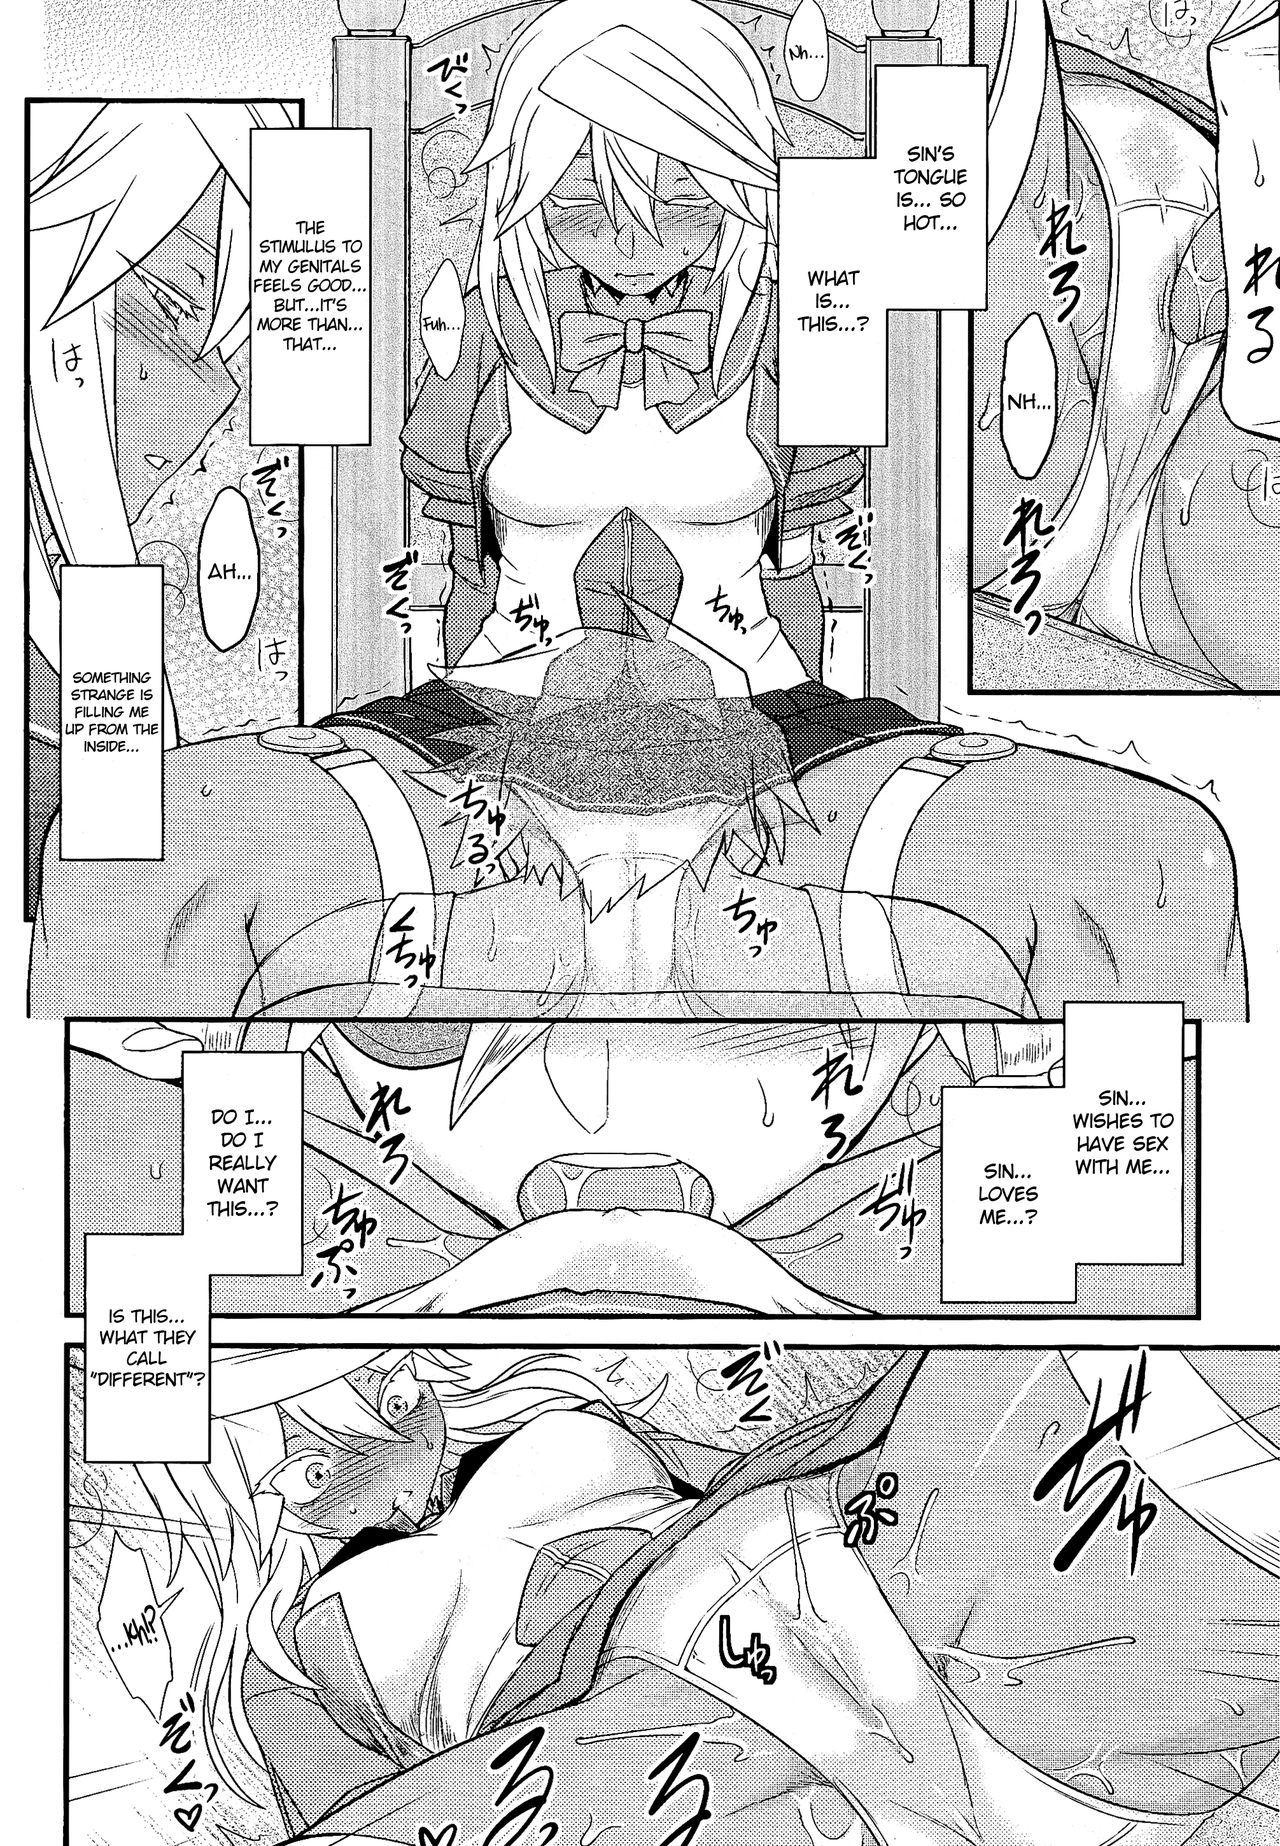 Guilty gear manga hentai